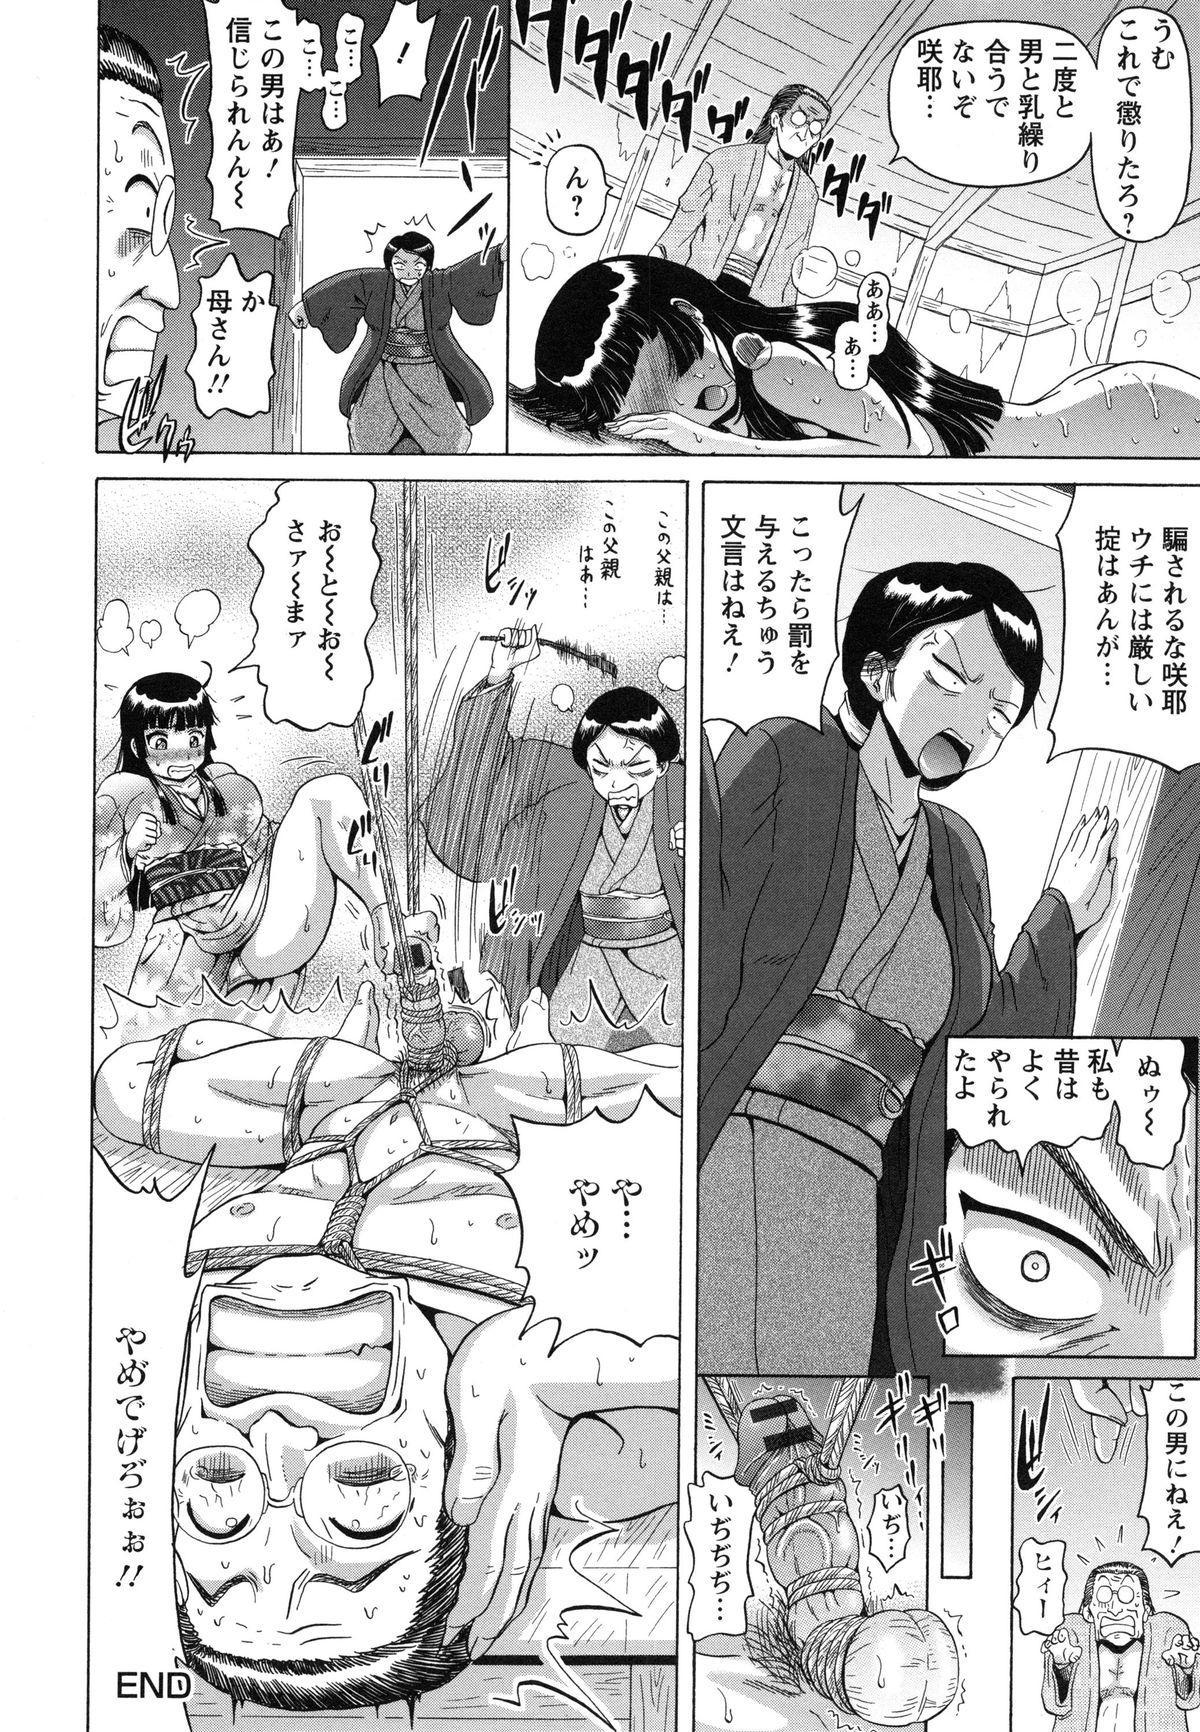 [Nukunuku Orange] Seikou ~Maeana Kanzen Houchi~ - Keep Anus in Anguish!!!! 67